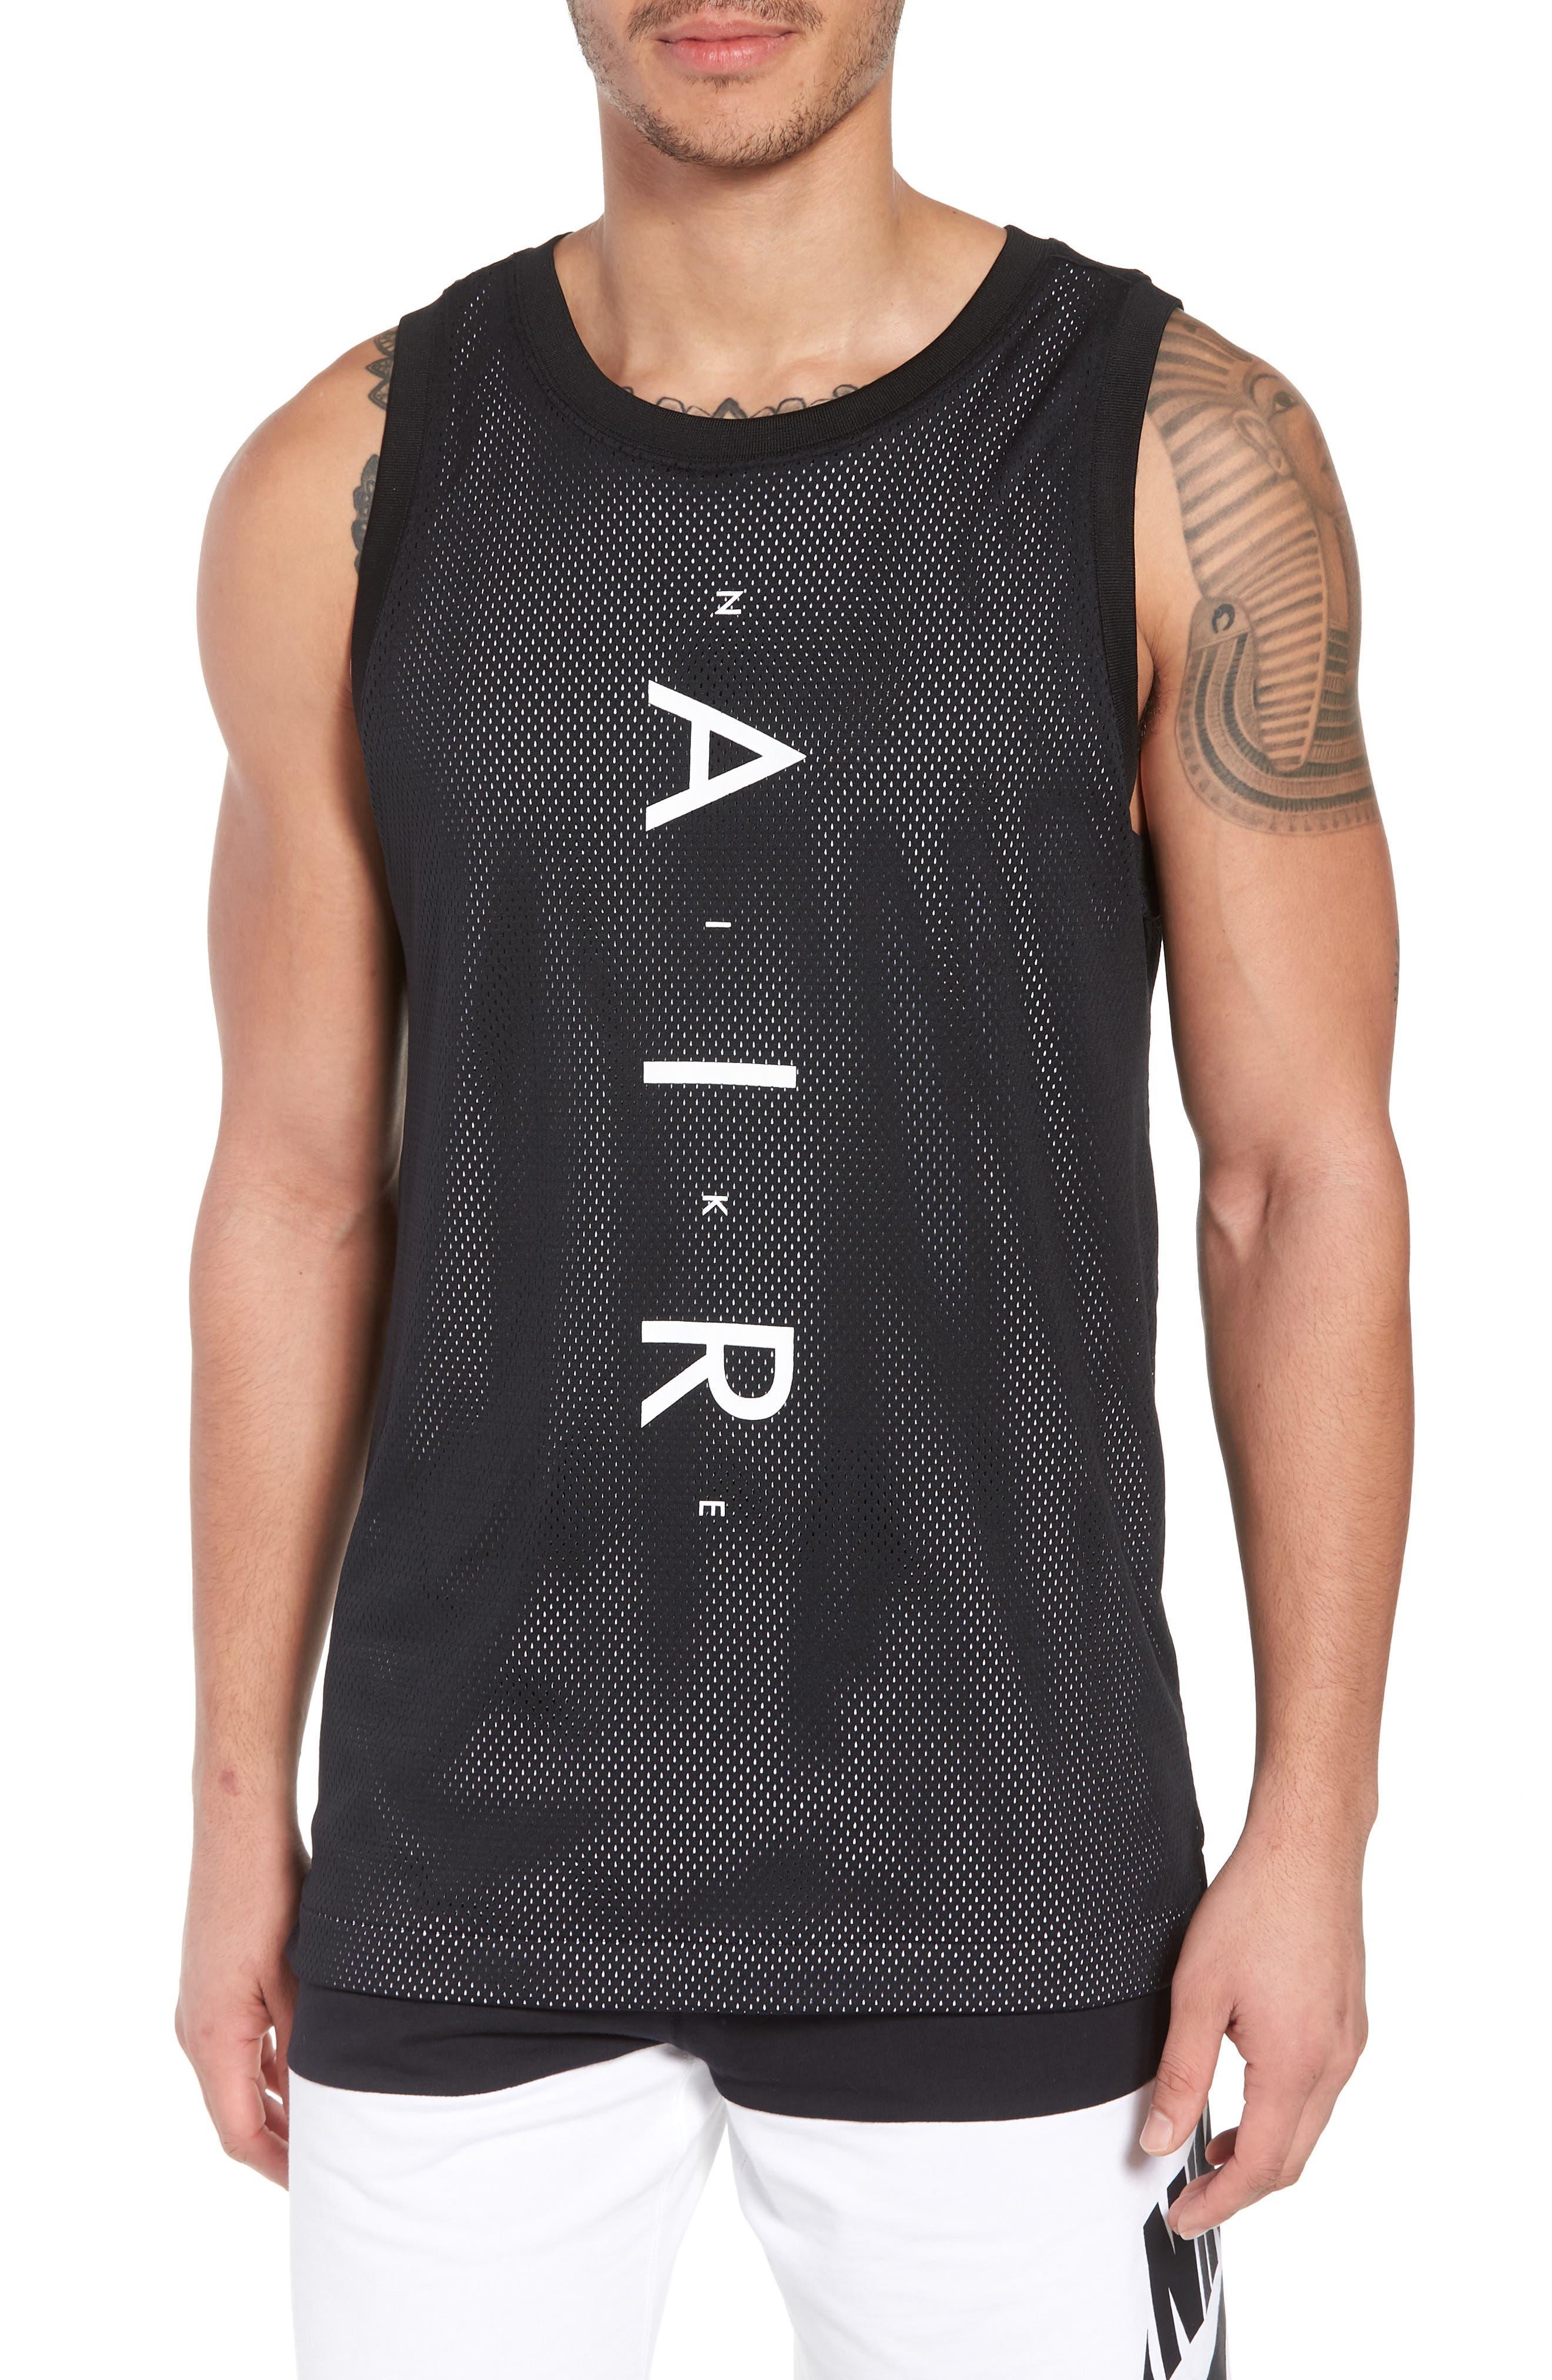 Sportswear Air Knit Tank,                             Main thumbnail 1, color,                             Black/ White